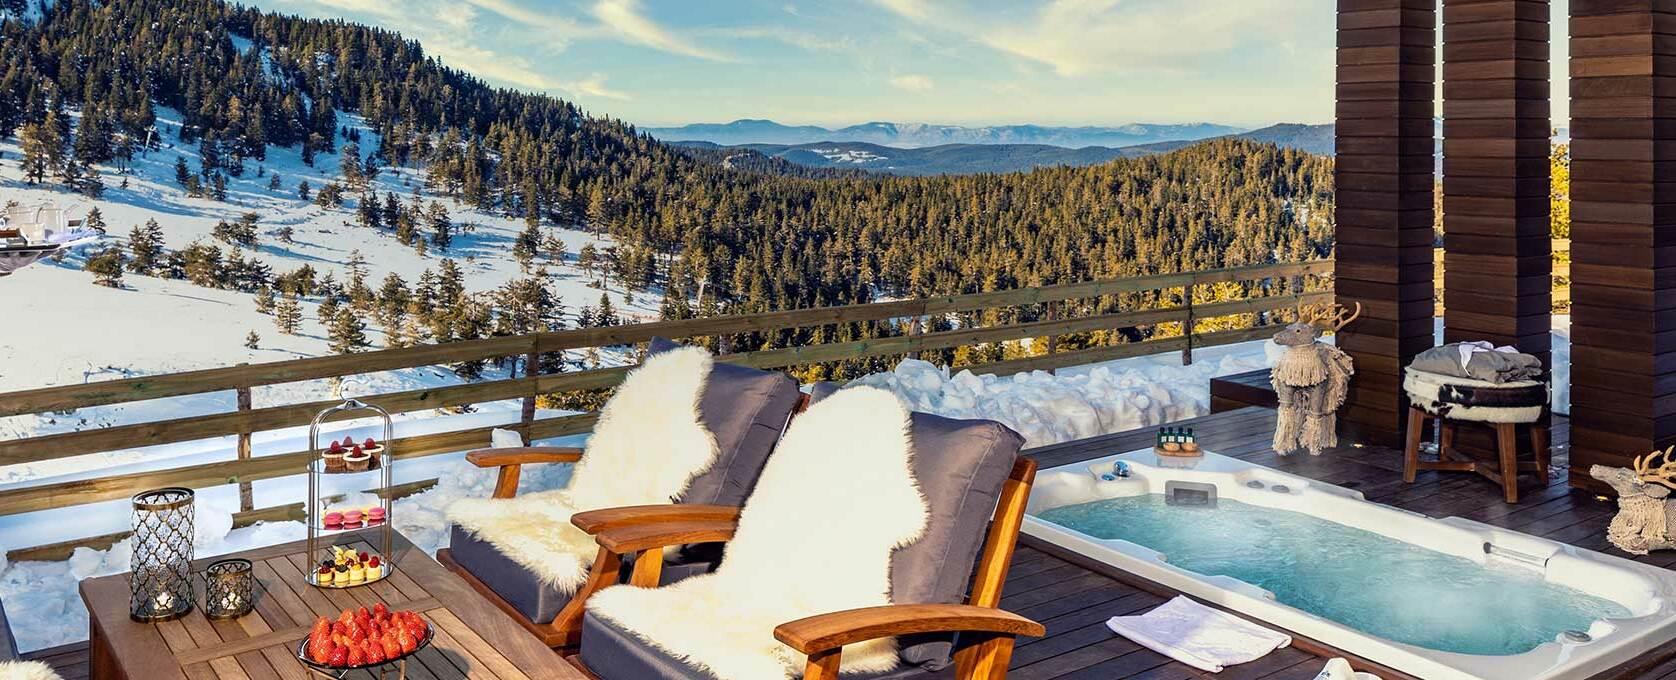 Терраса Kaya Palazzo Ski & Mountain, фото